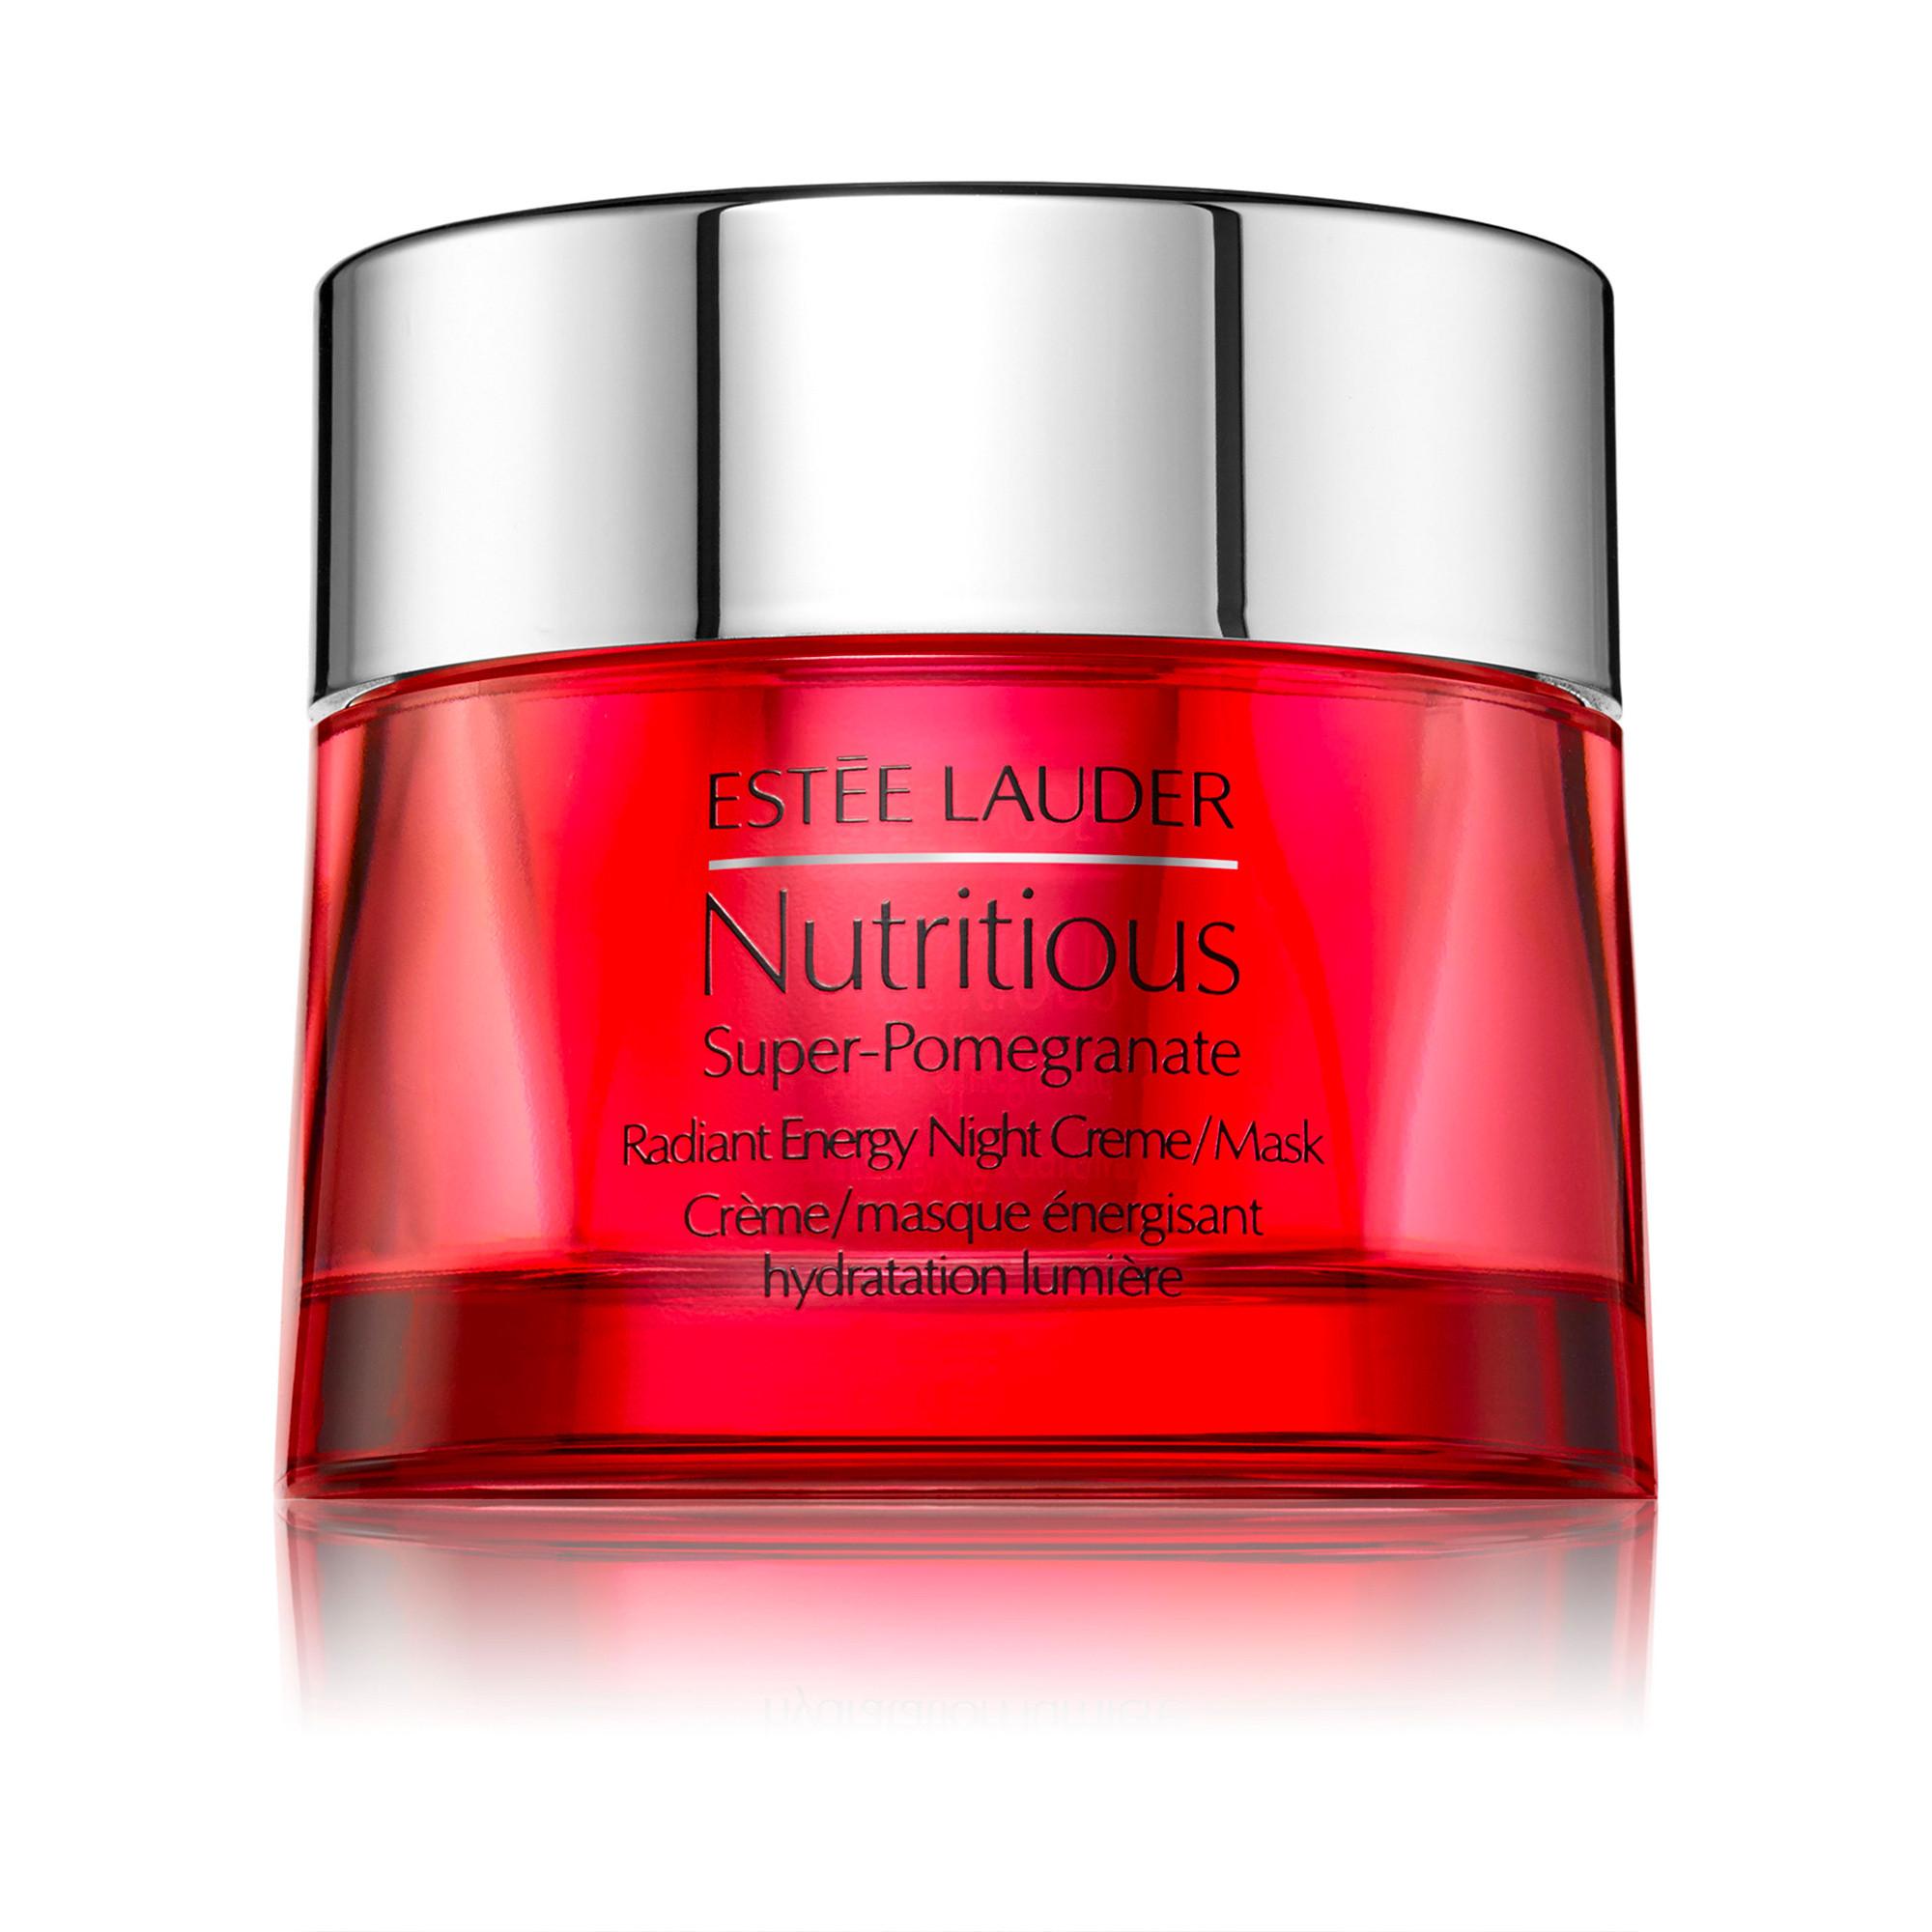 Estée Lauder nutritious super-pomegranate radiant energy night creme/mask 50 ml, Azzurro, large image number 0